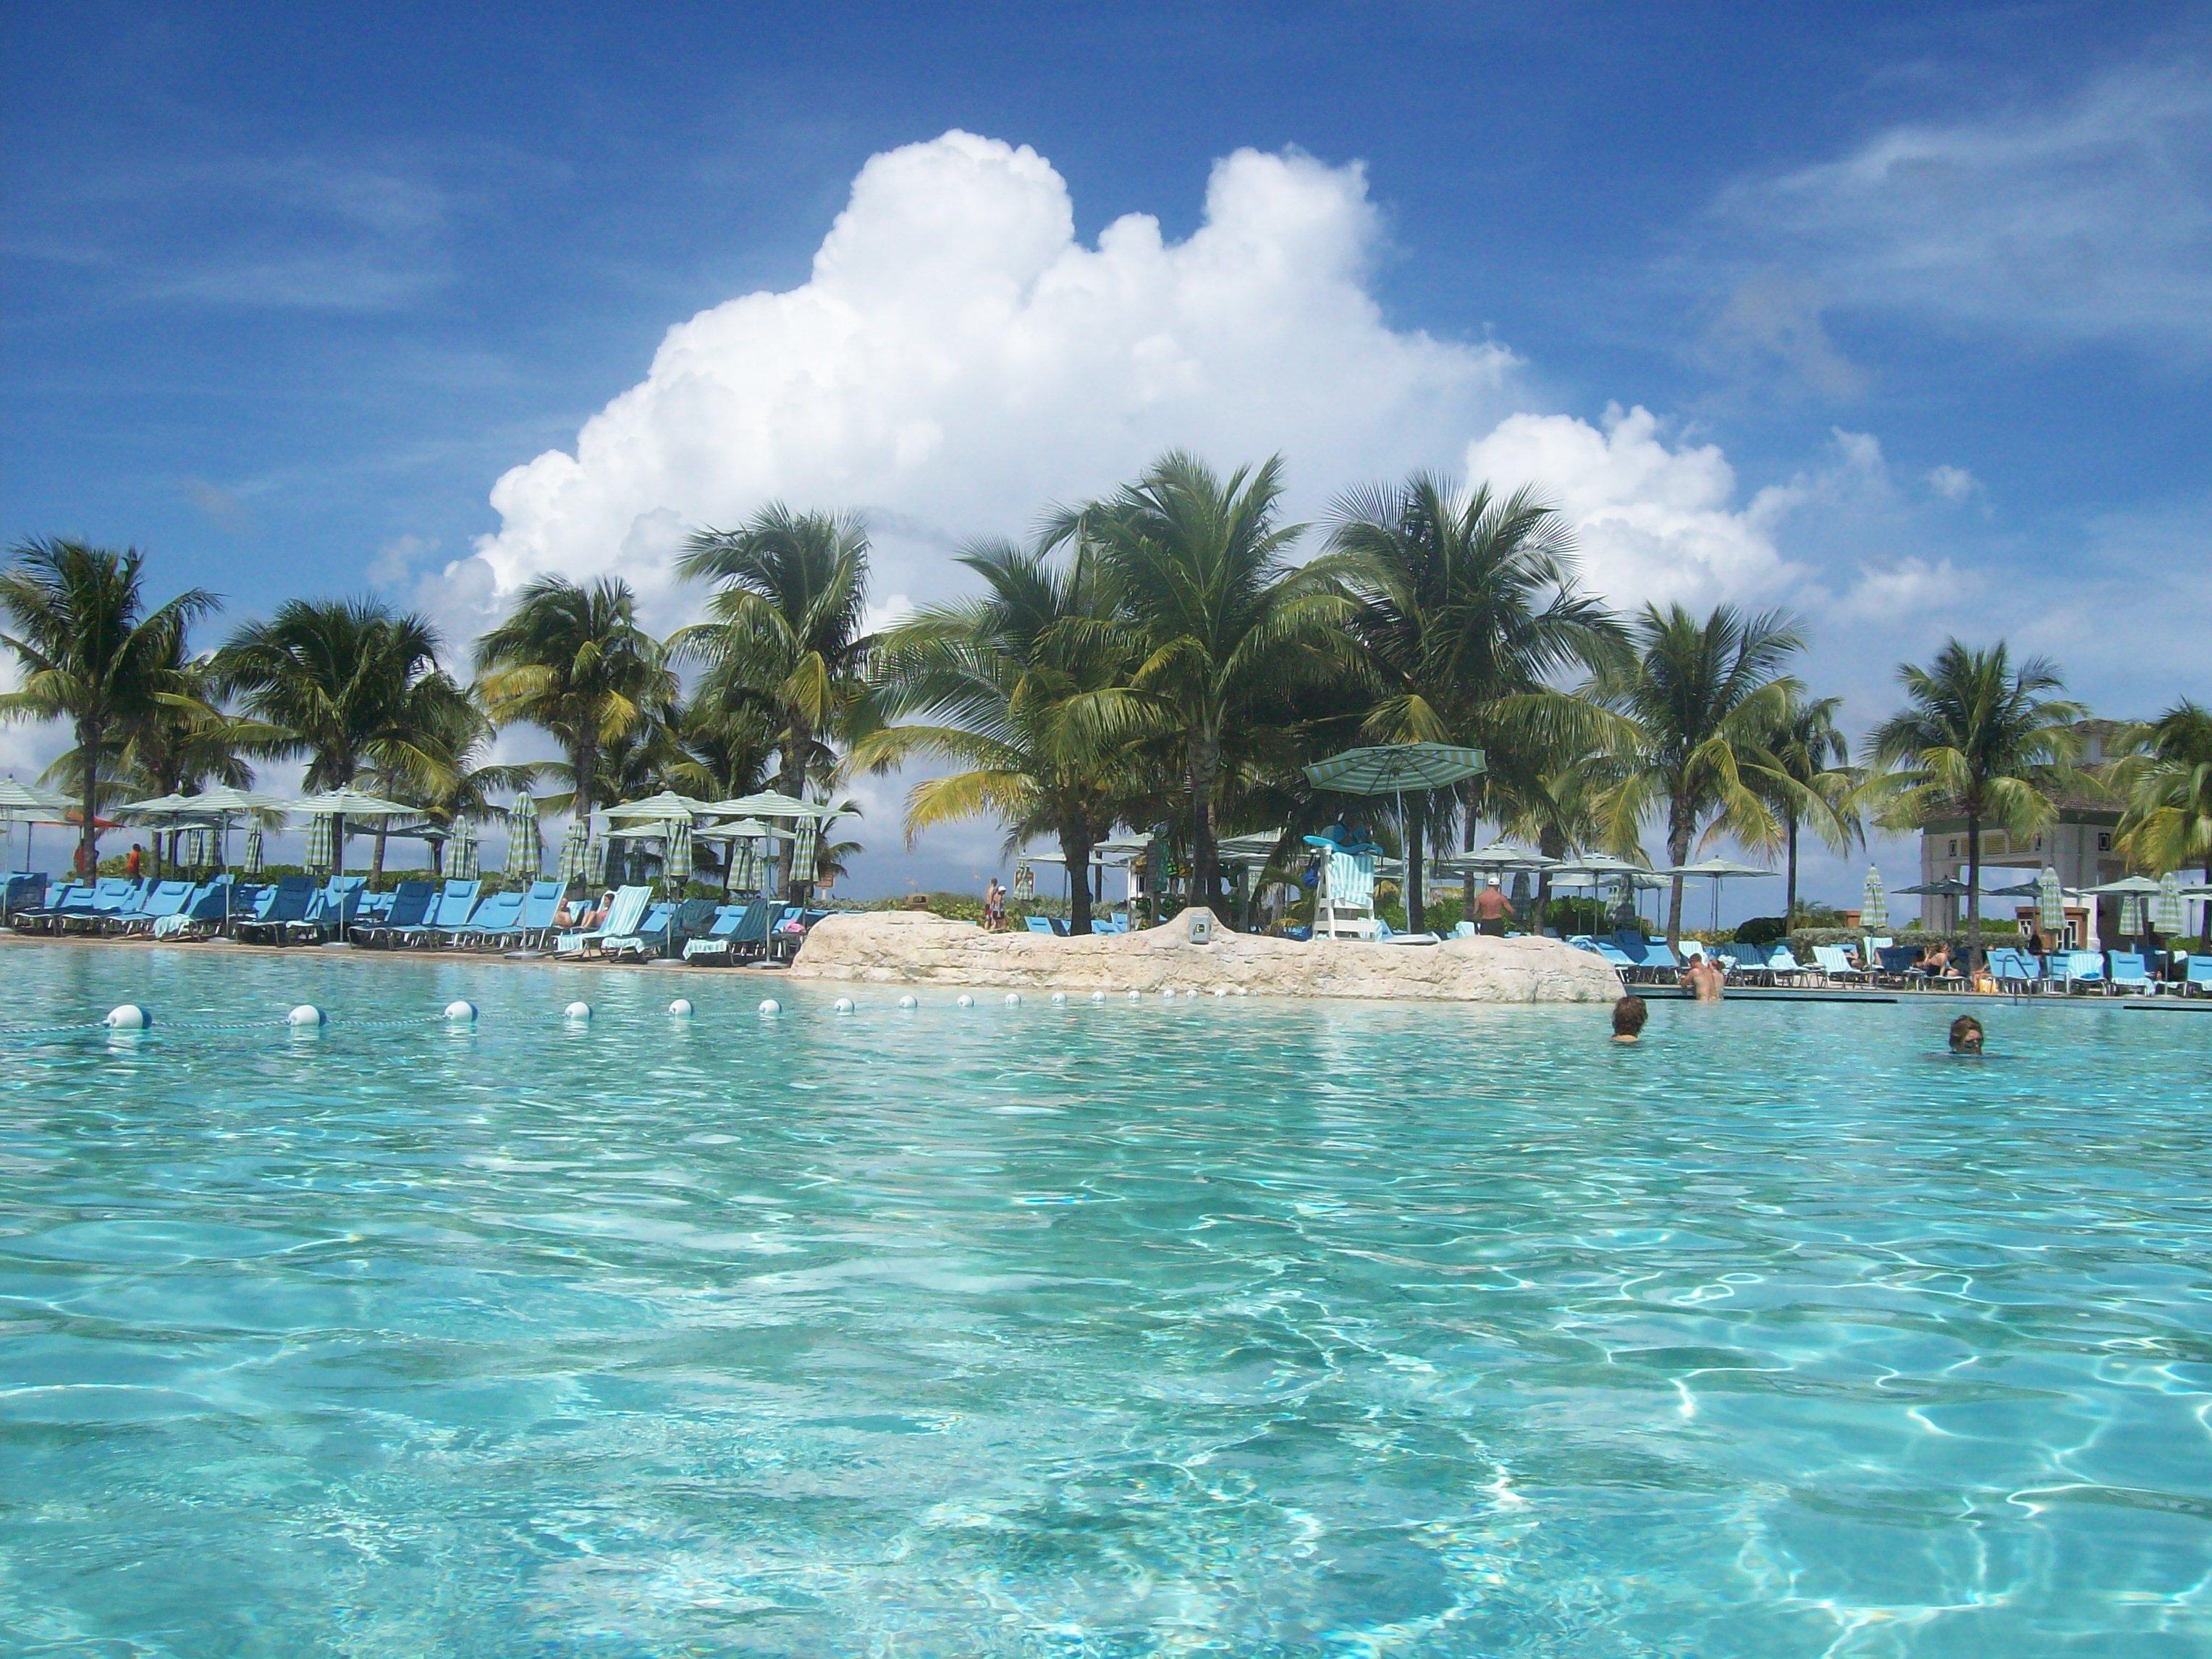 Des piscines.JPG